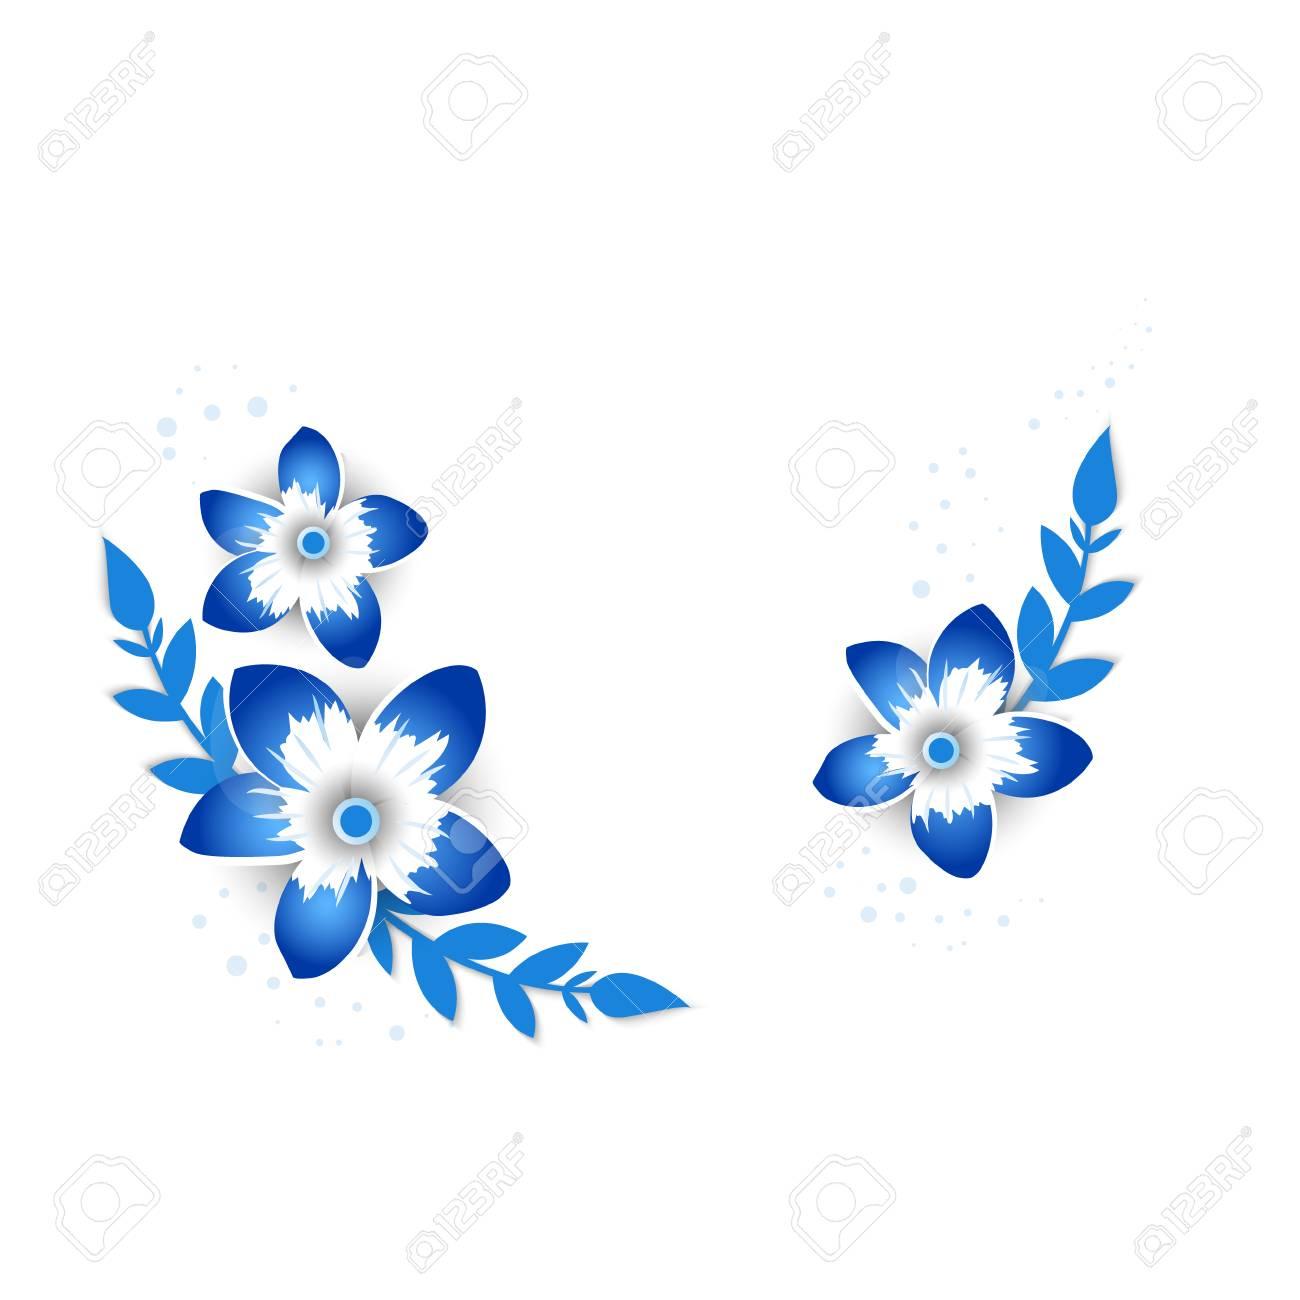 Paper Art Carve Of Floral Vector Invite Card Creative Delicate